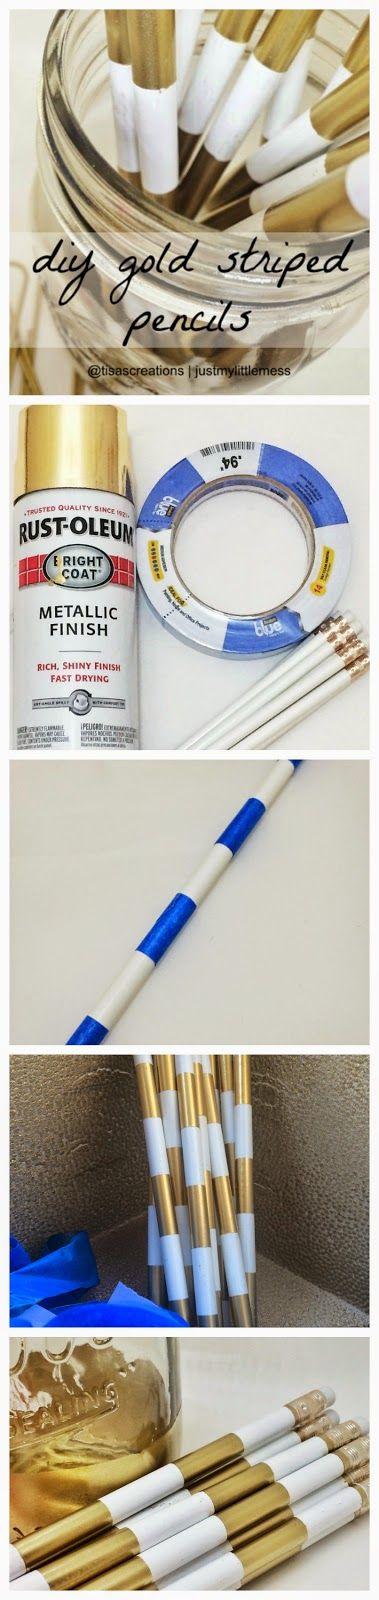 DIY gold striped pencils